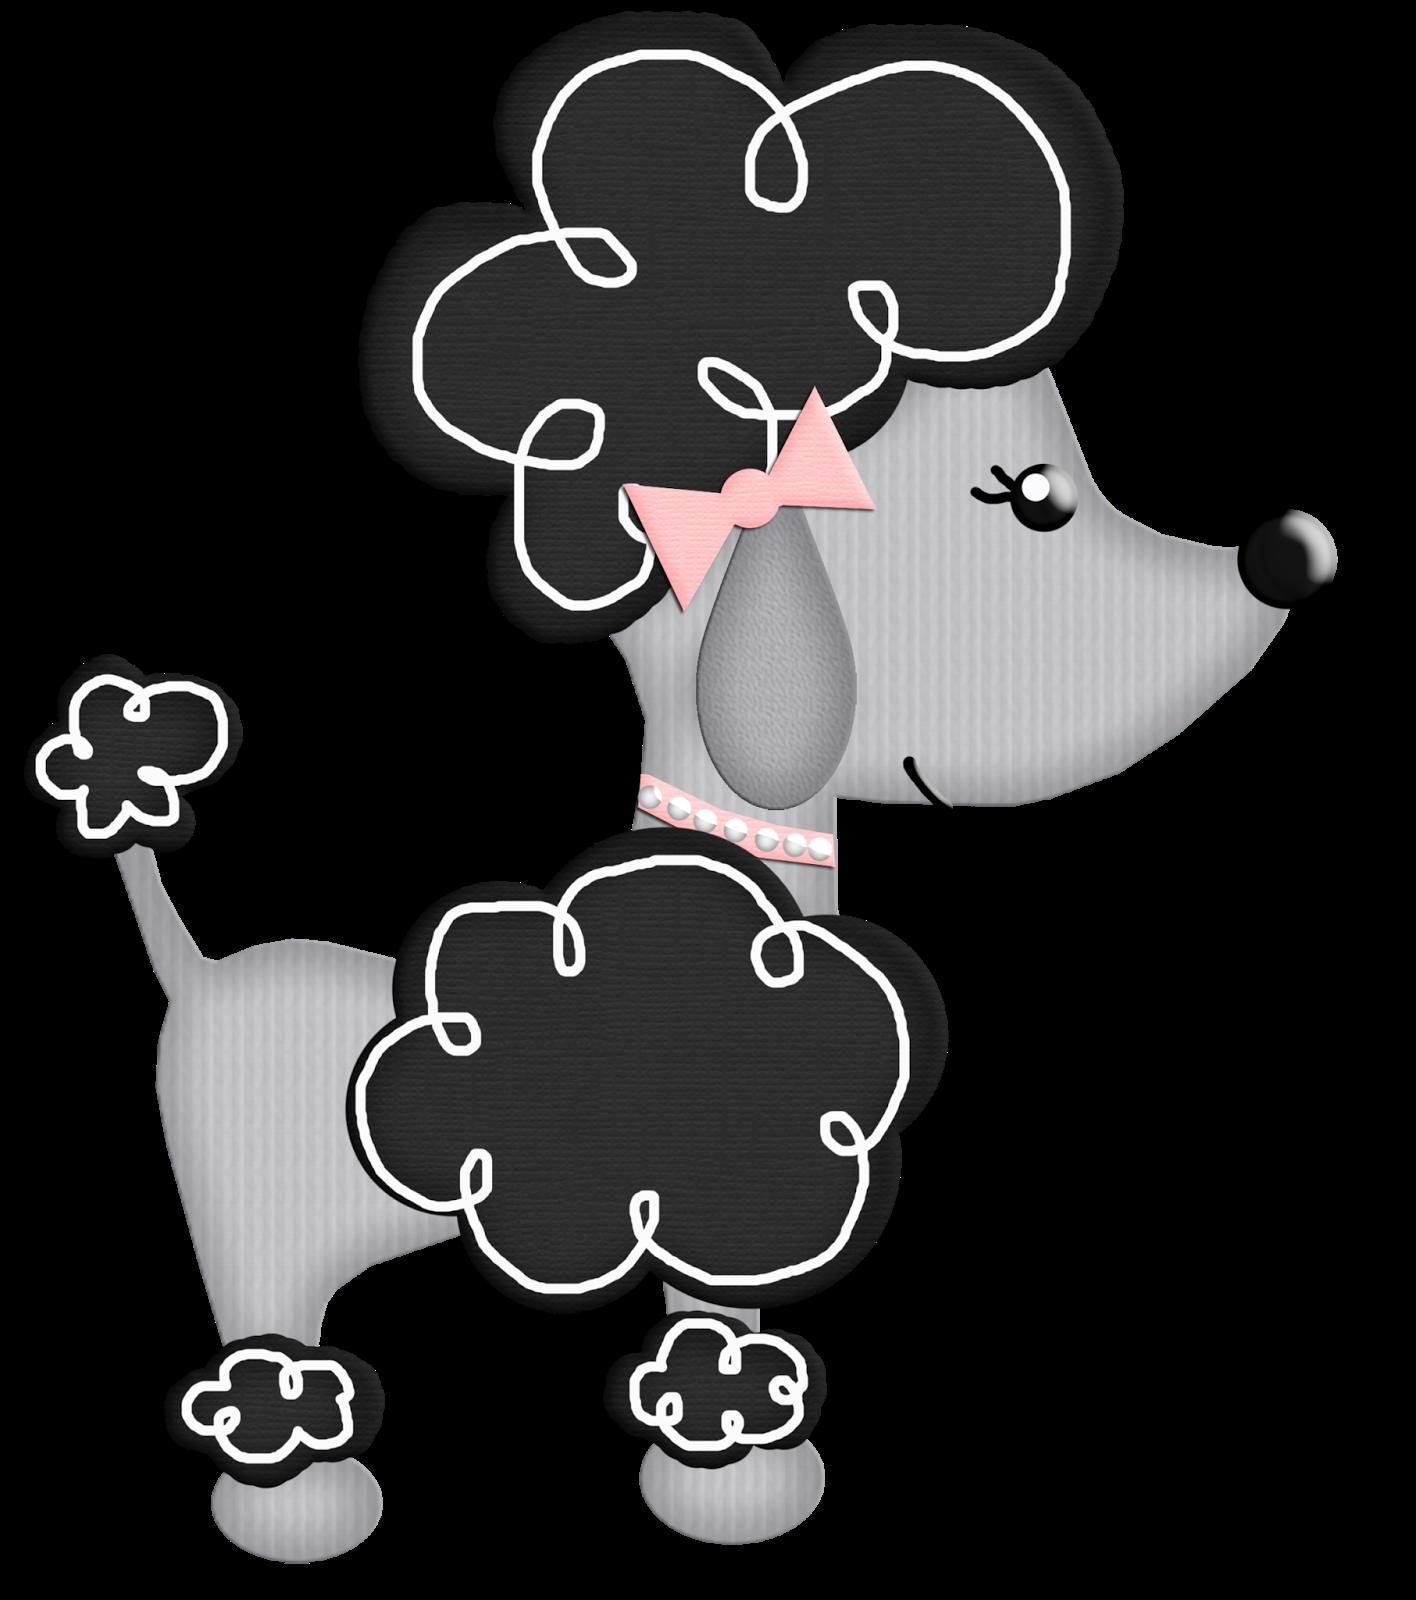 graphic free download Bello chic paris cumple. Poodle clipart black and white.